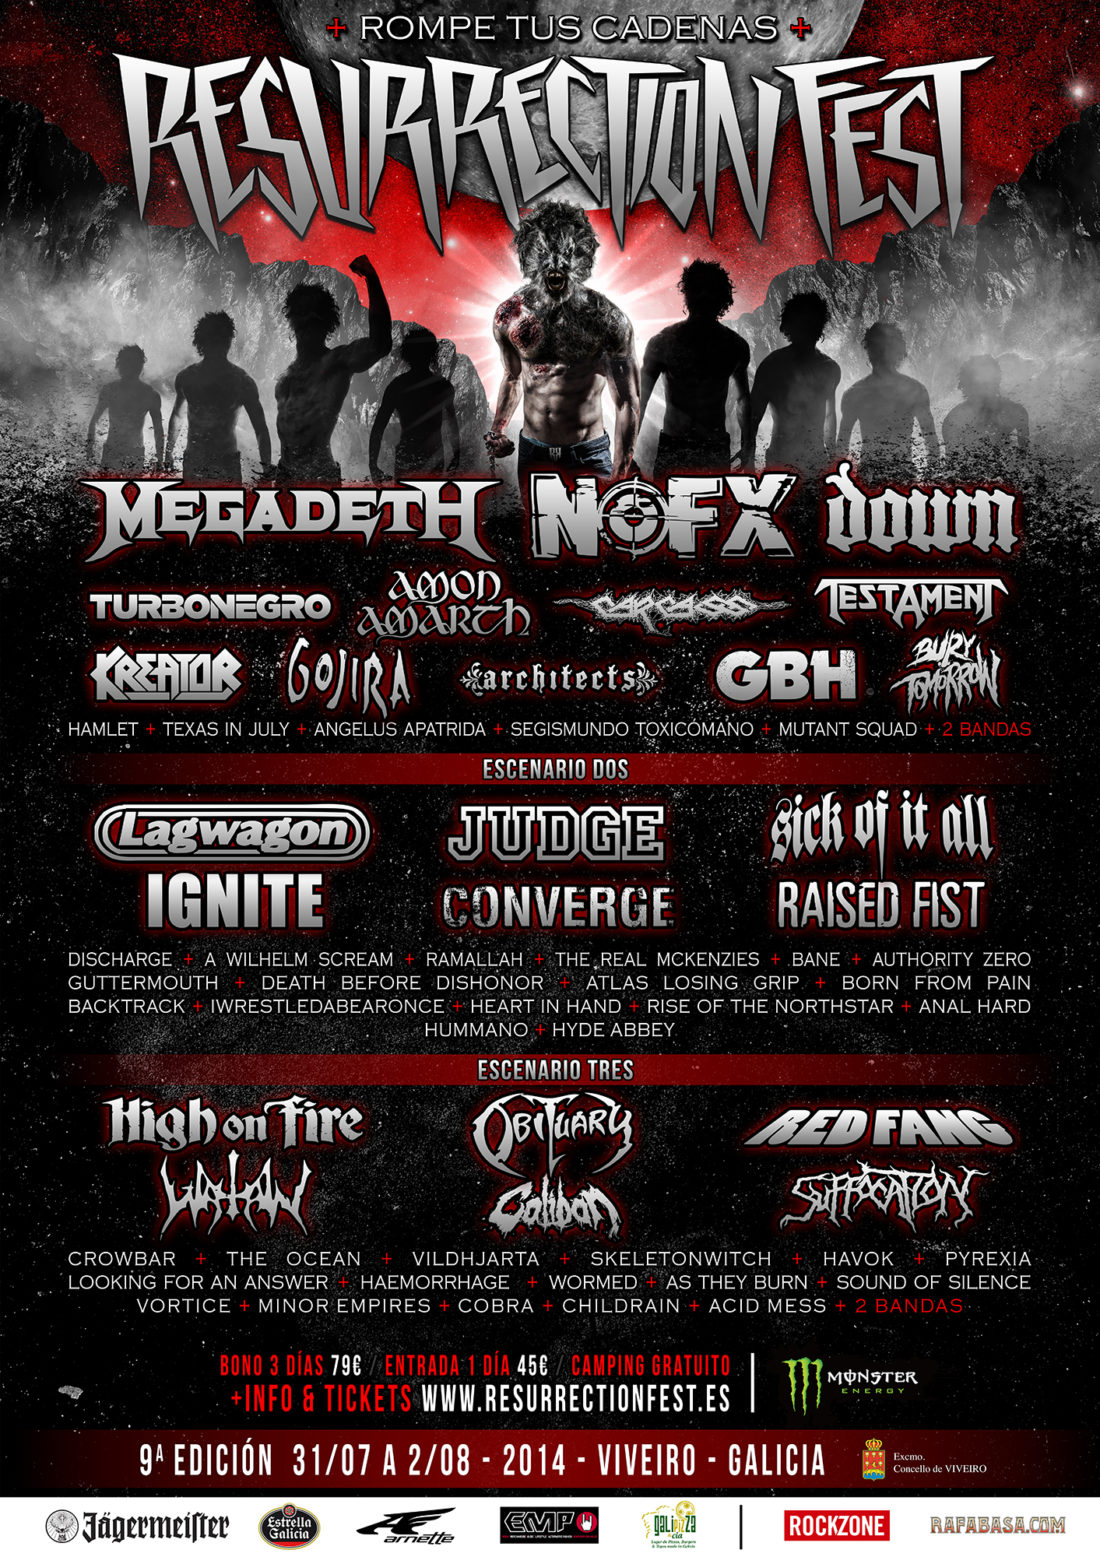 Resurrection Fest 2014: Megadeth, nuevo cabeza de cartel